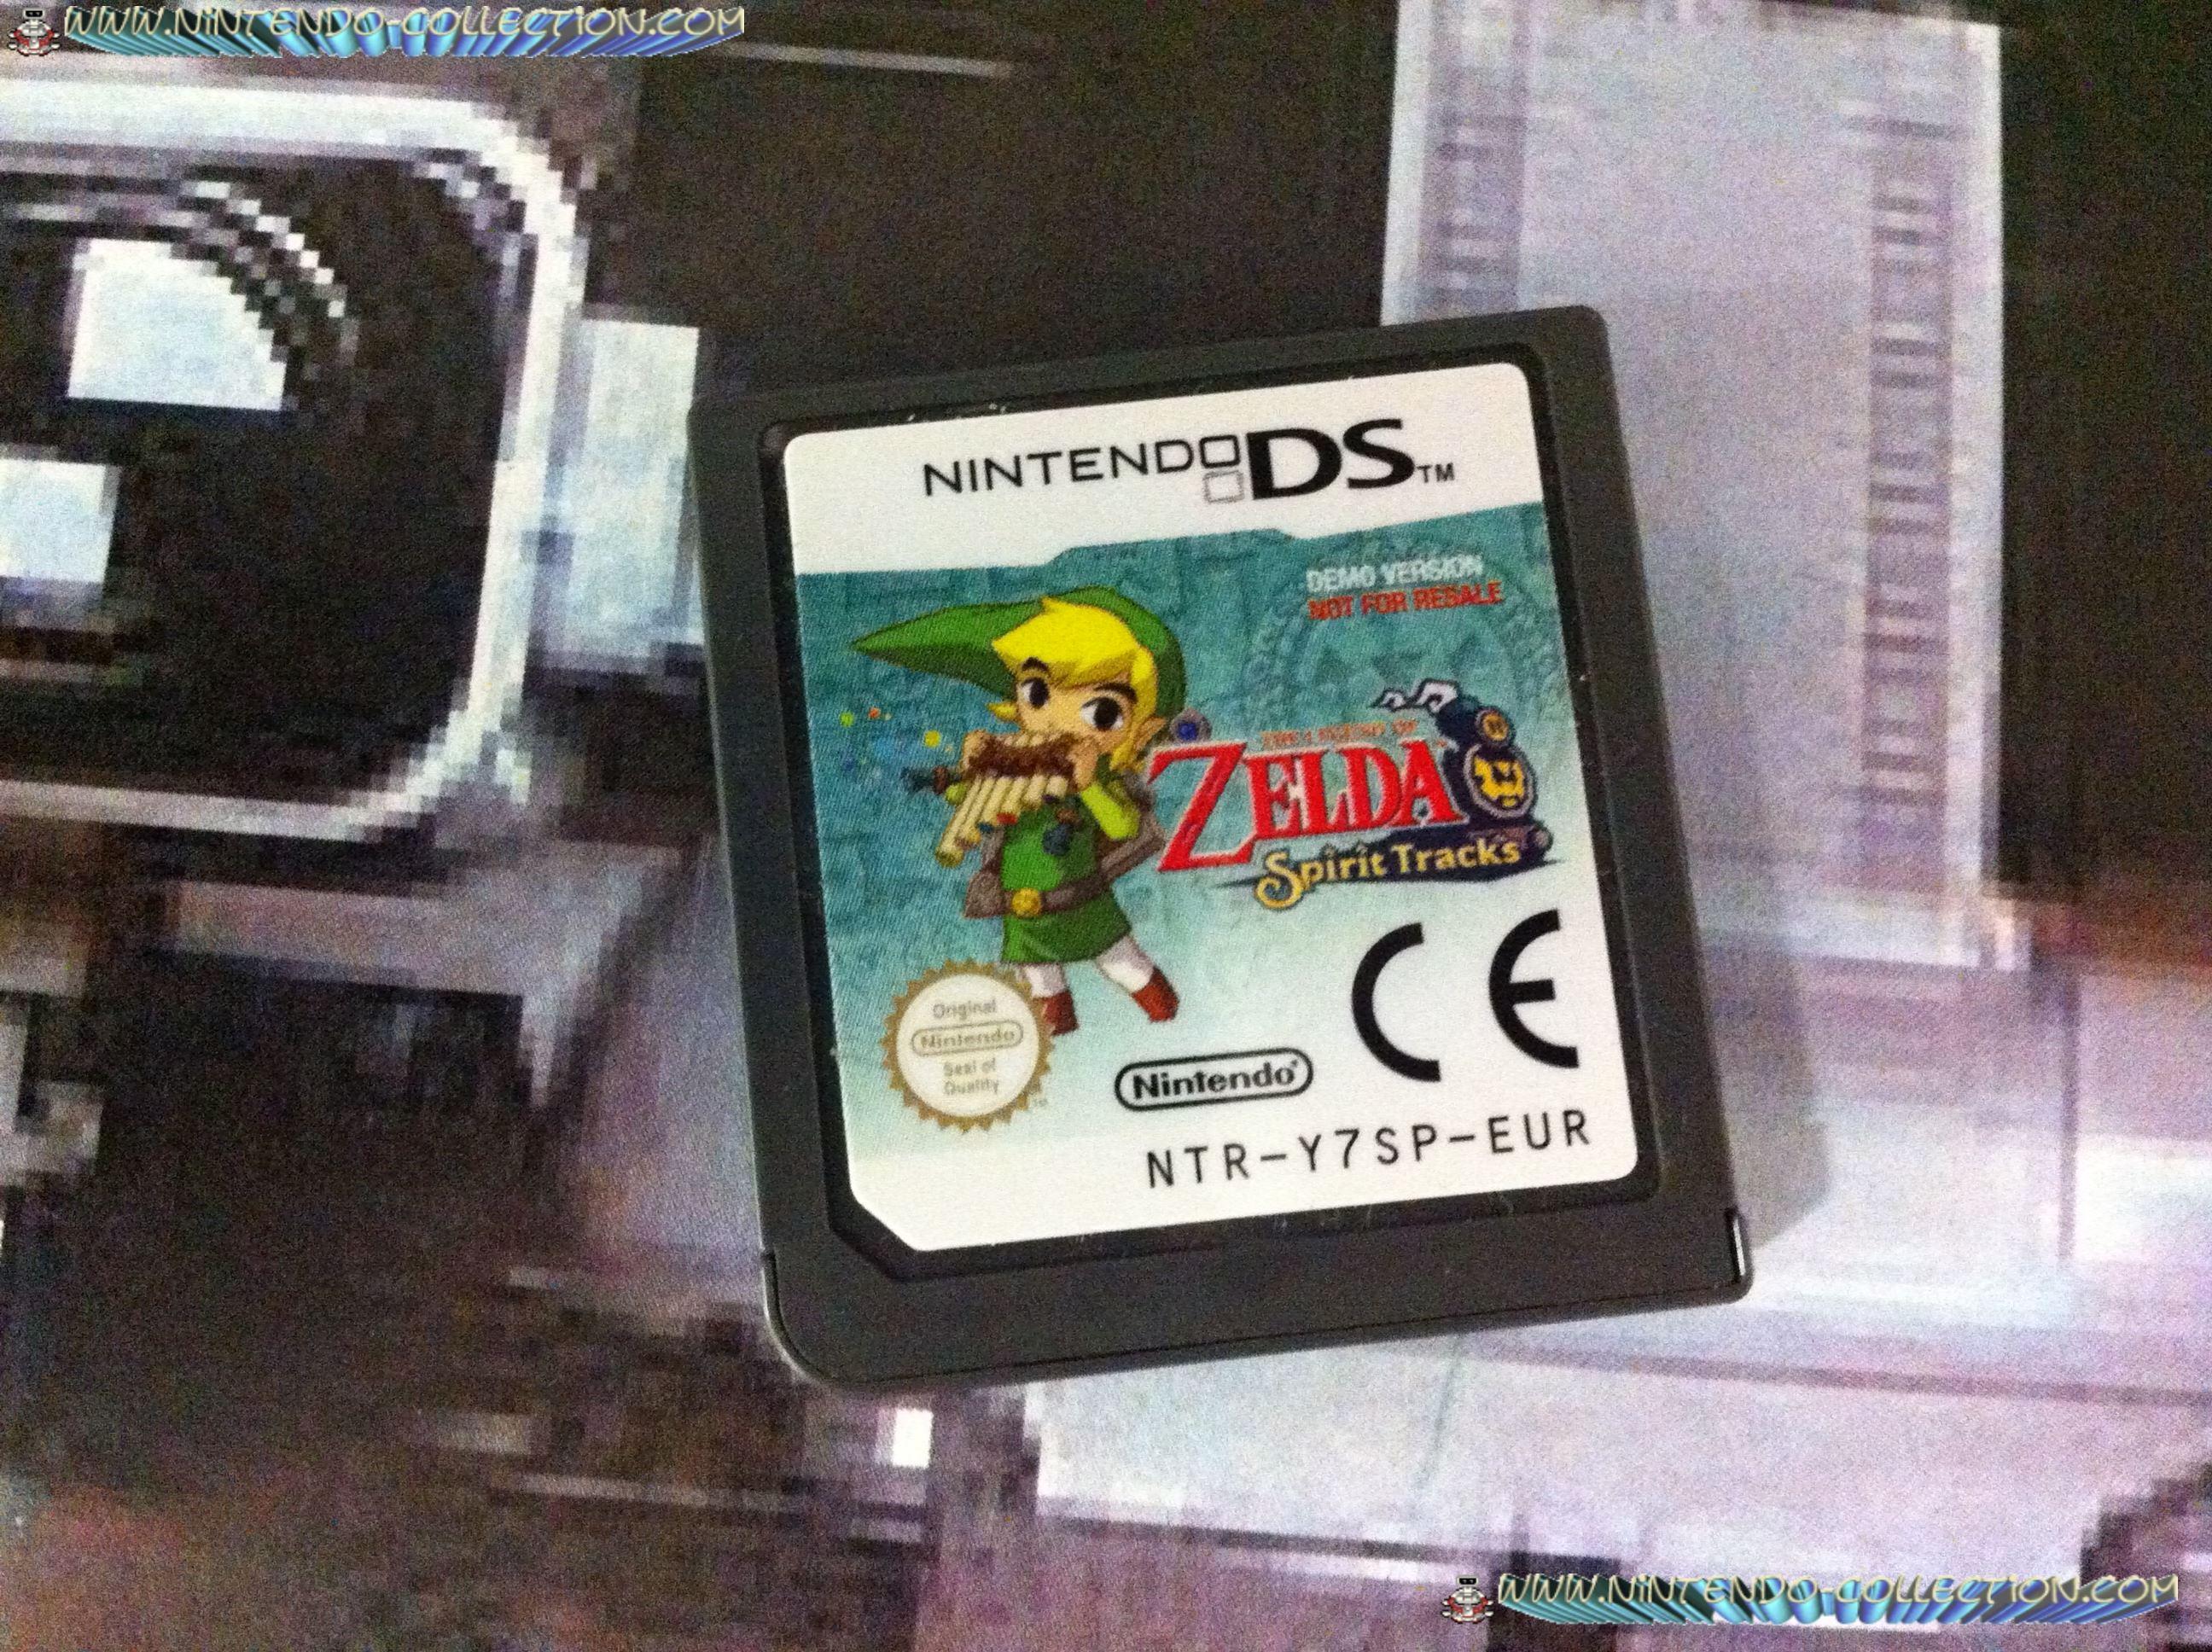 www.nintendo-collection.com - Demo DS 3 DS - Not For Resale - Zelda Spirit Tracks